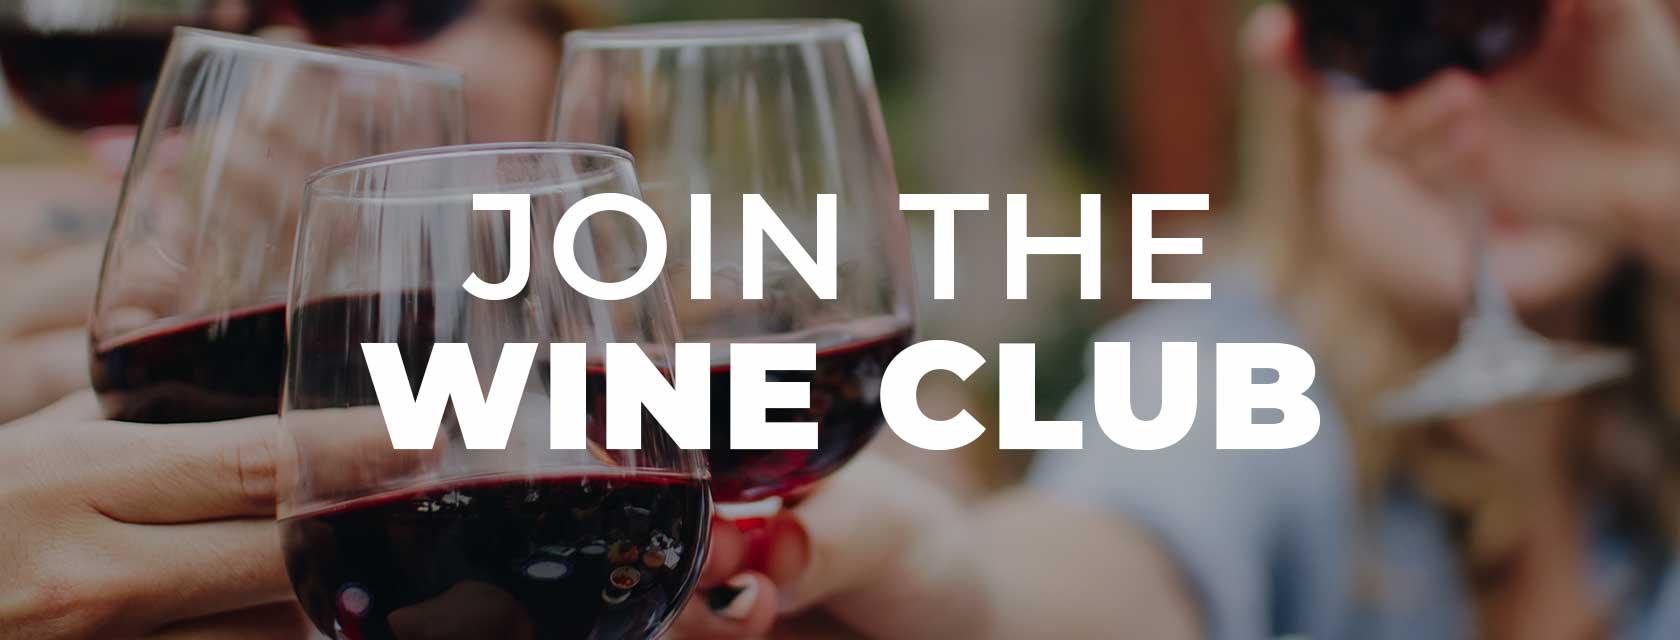 Vinotopia Wine Club Promo Banner Image